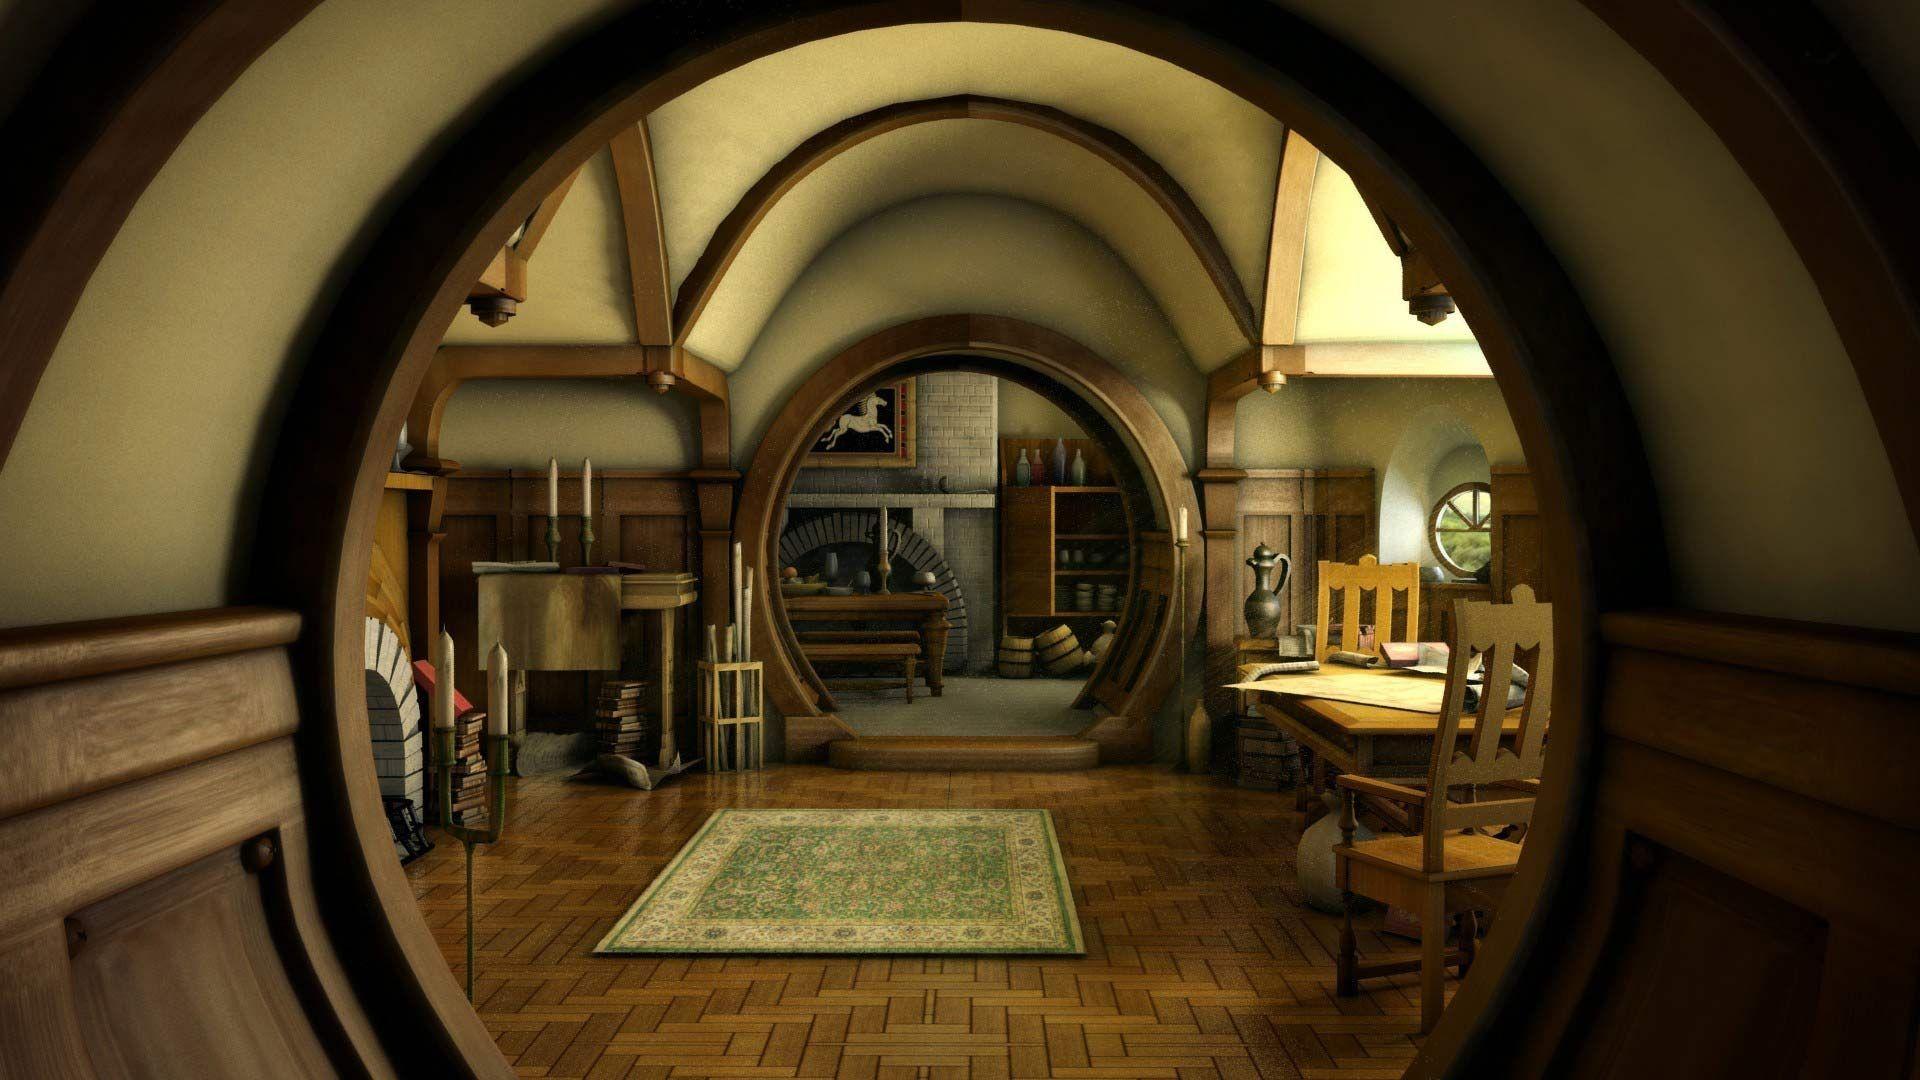 Hobbit House The Hobbit Movie Wallpaper LOTR and The Hobbit